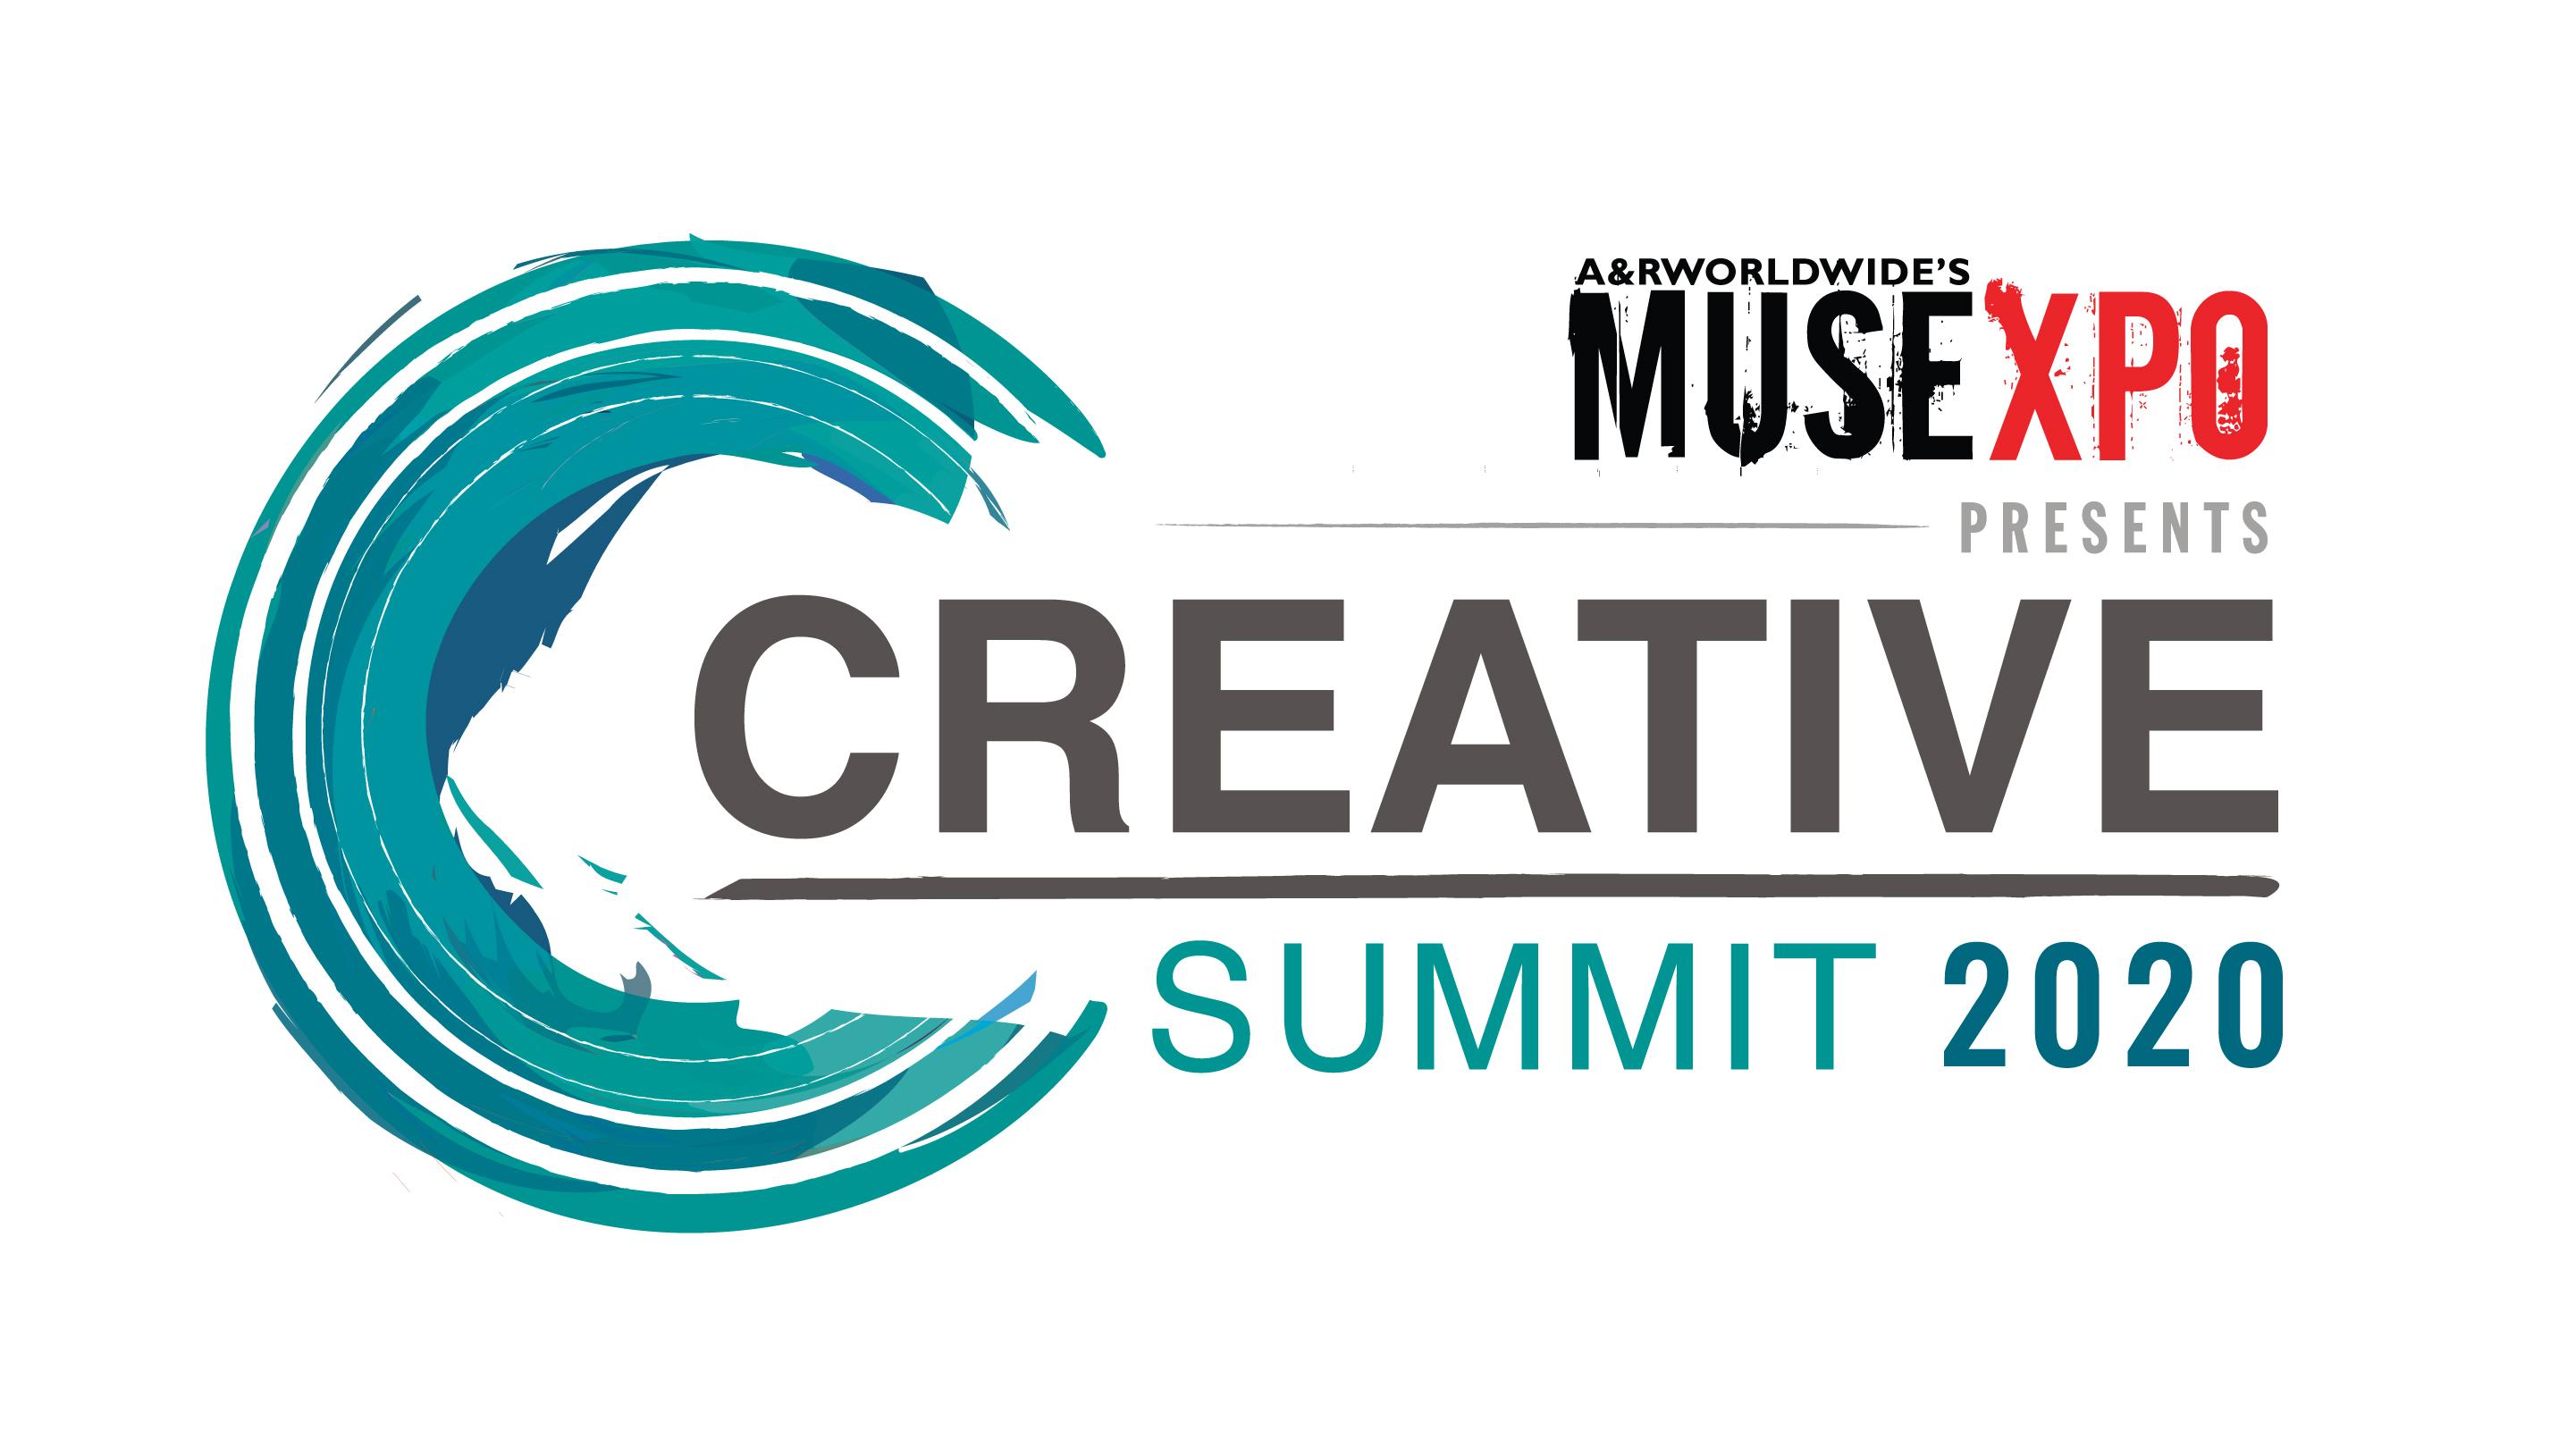 MUSEXPO Creative Summit 2020